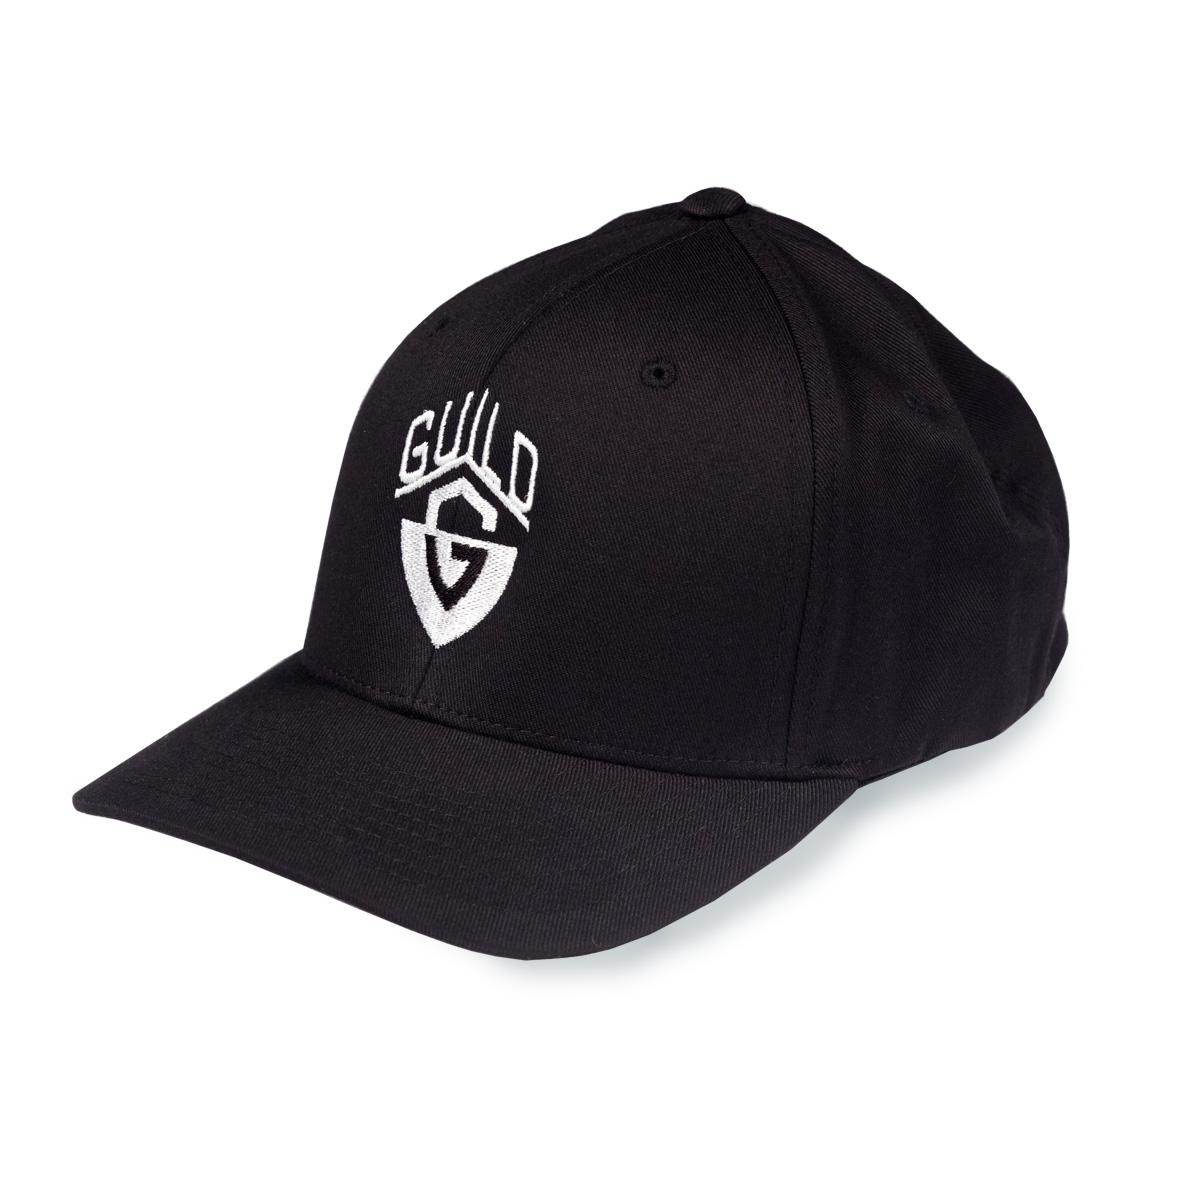 Guild Flexfit Baseball Hat  049cac8a32a